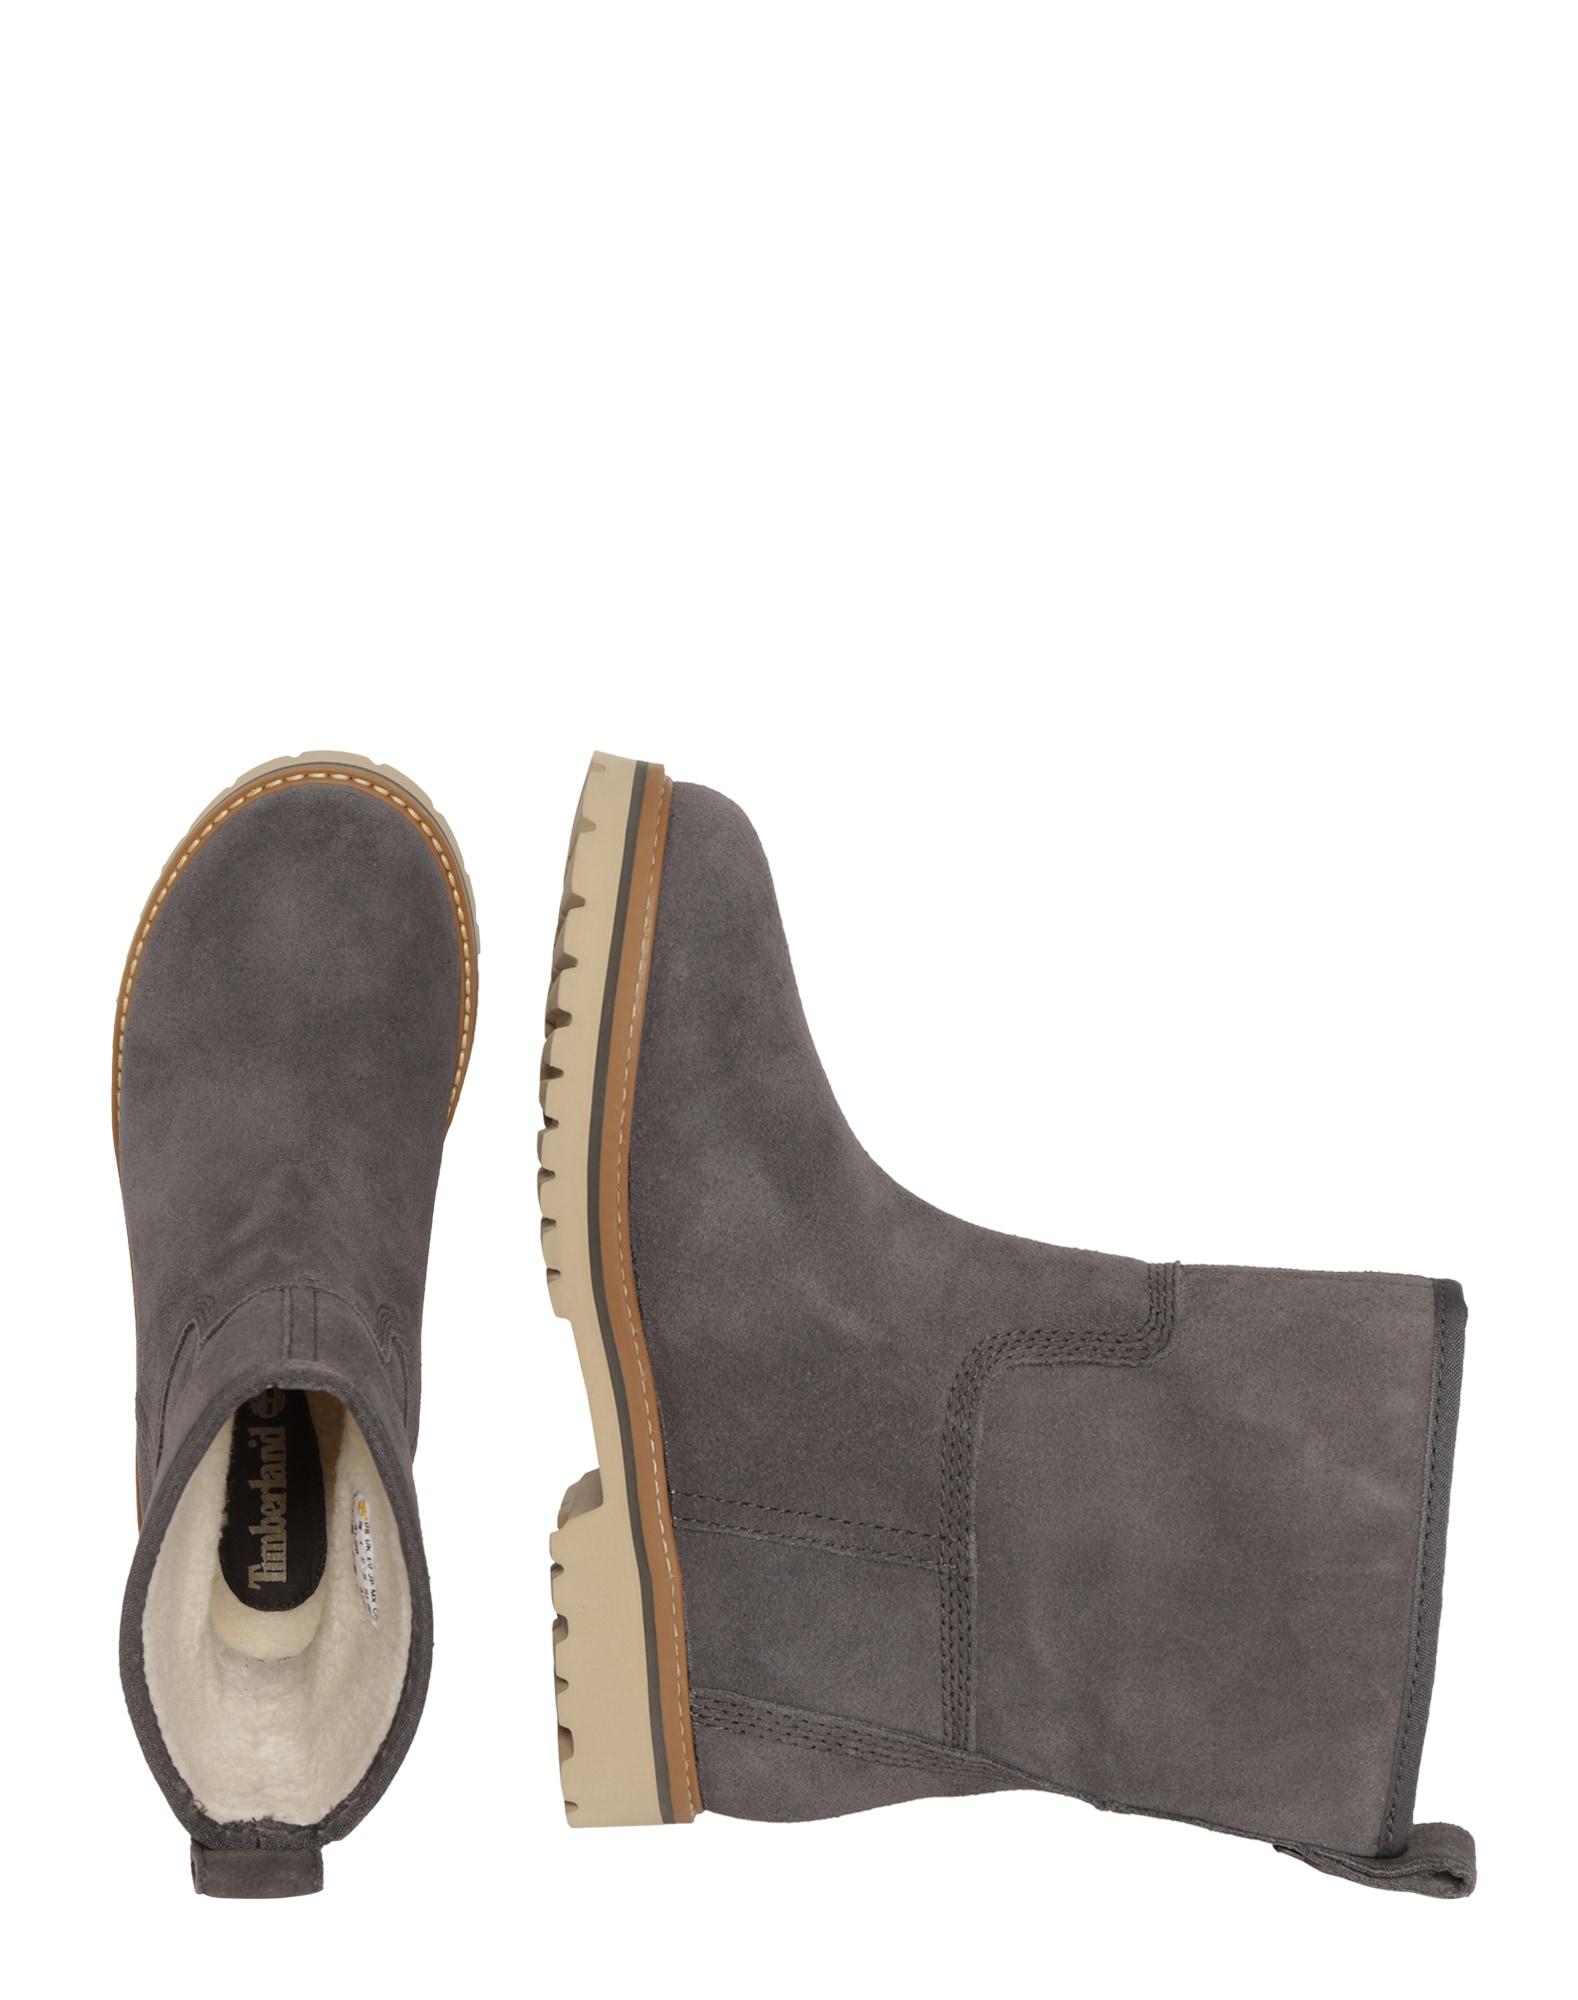 Boots 'Chamonix Valley'